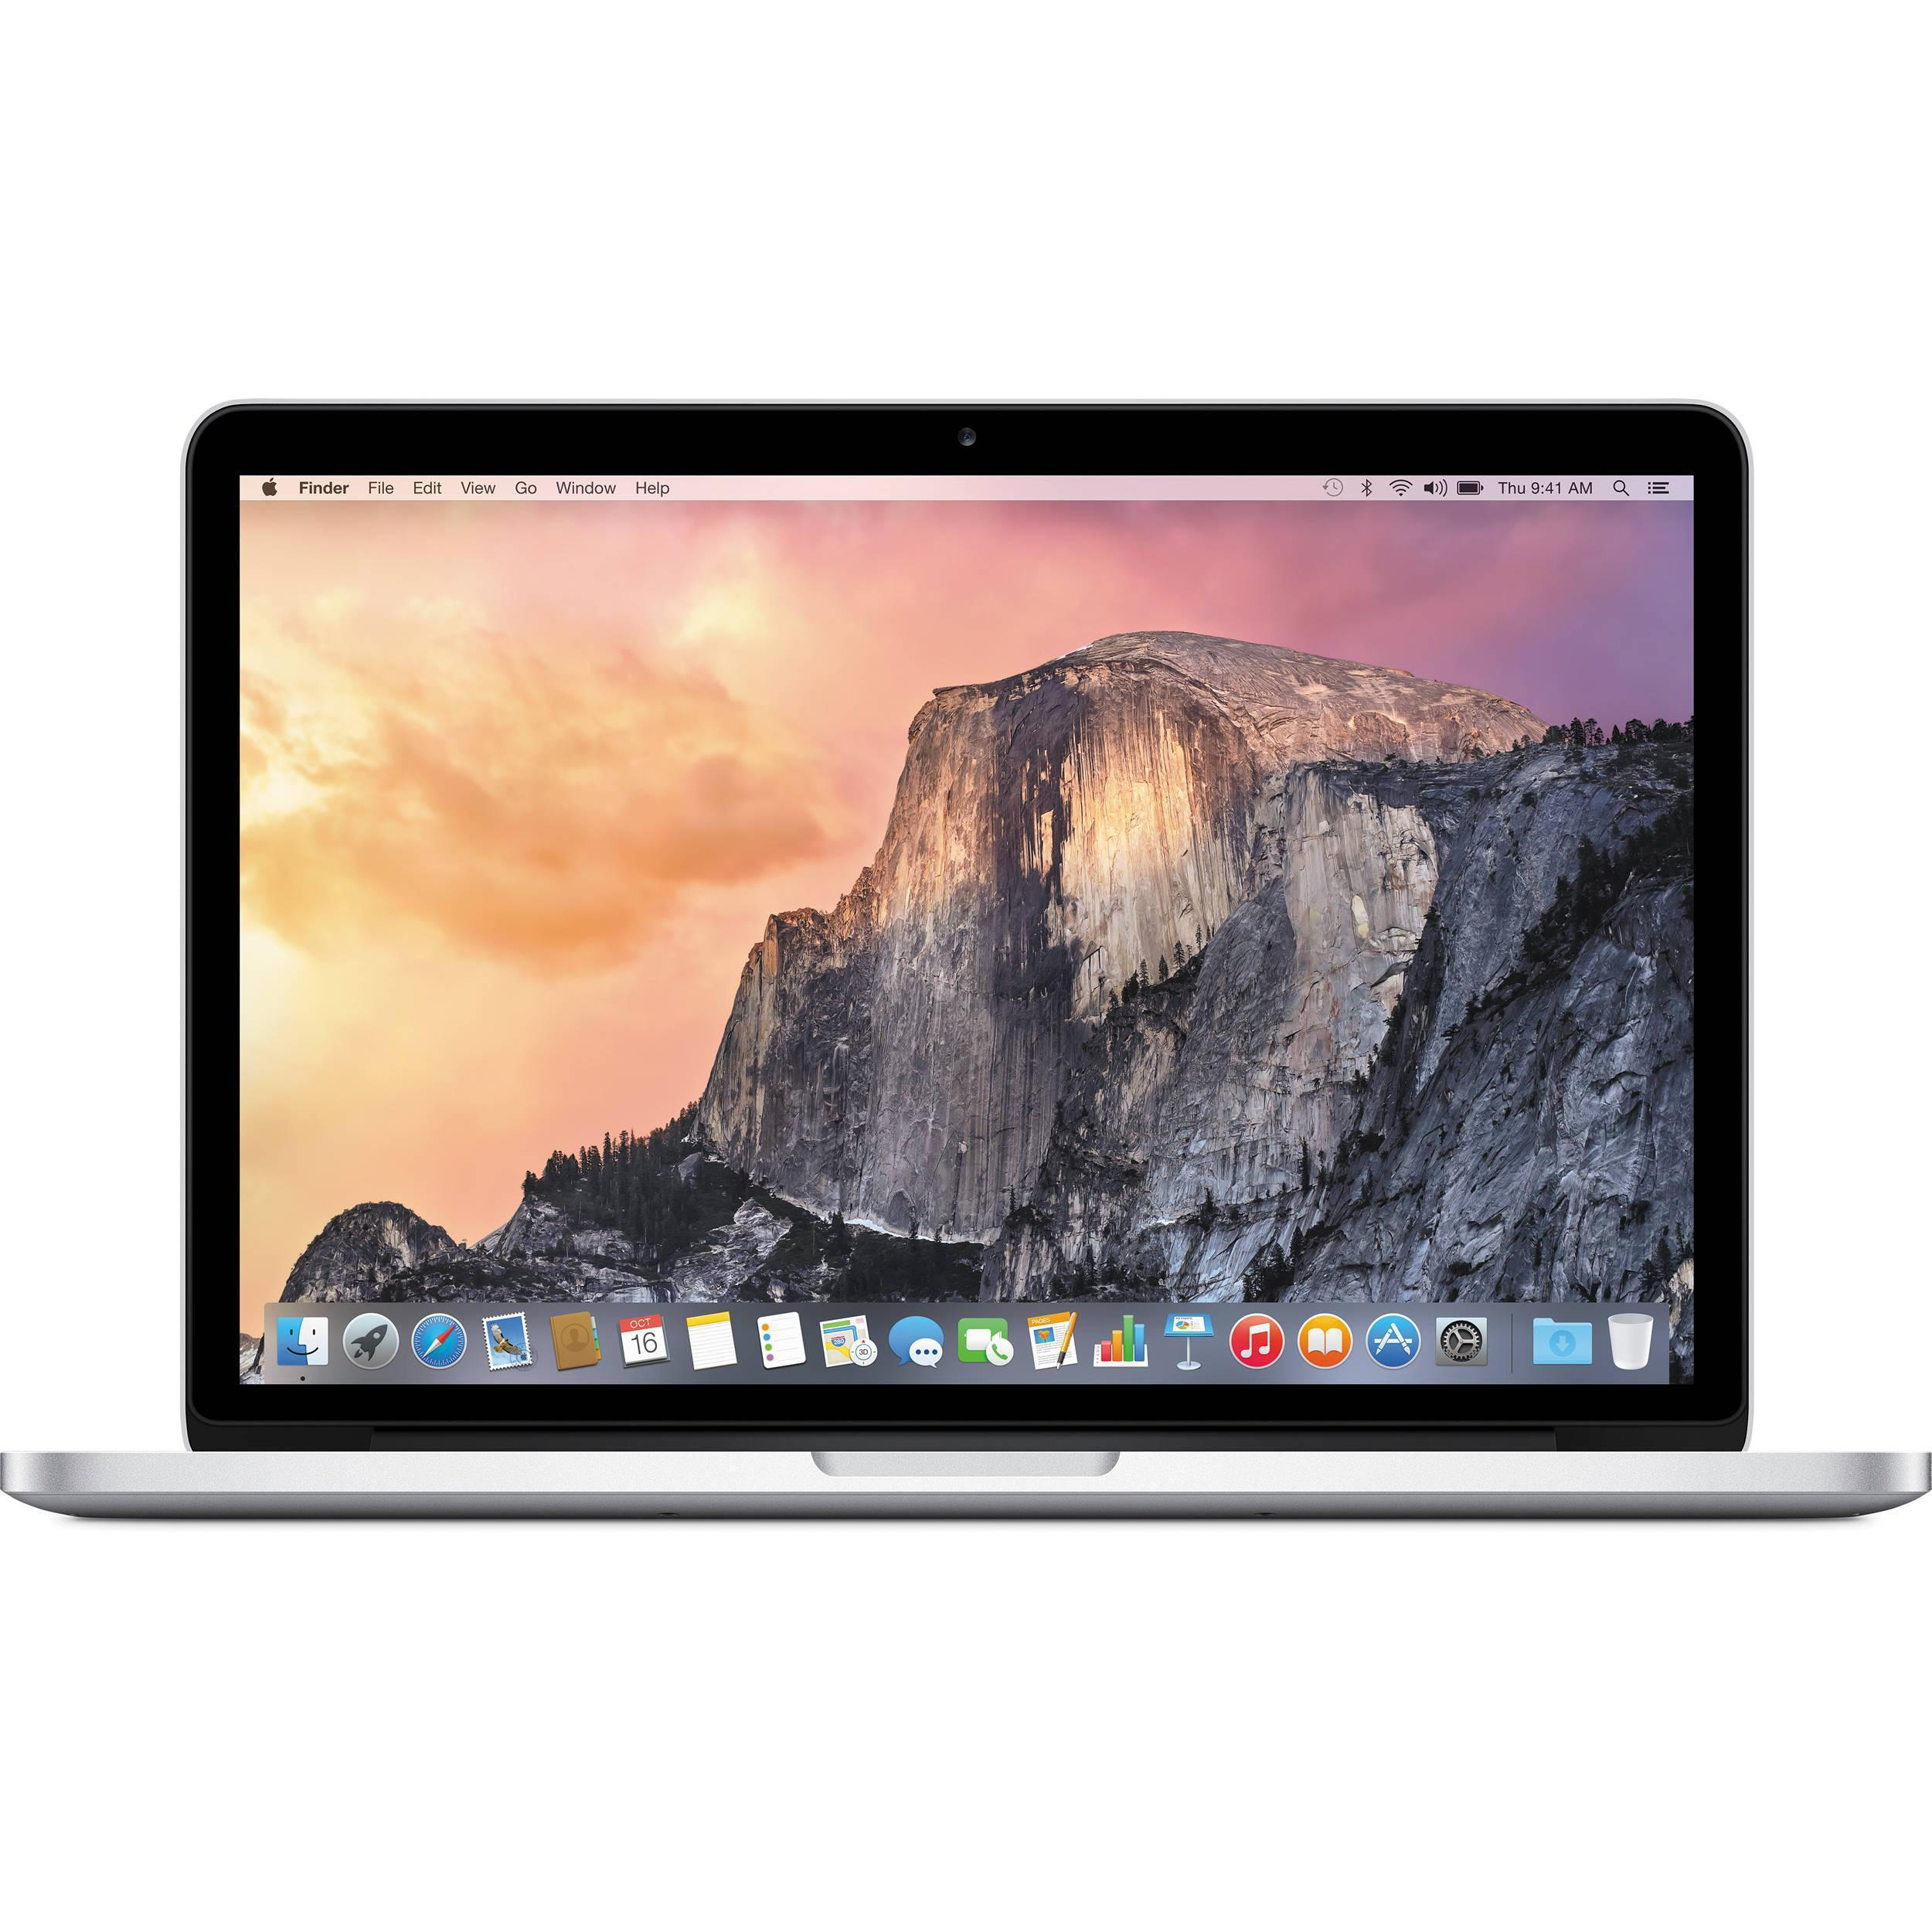 MacBook Pro Retina 13.3-inch (2015) - Core i7 - 8GB - SSD 256 GB QWERTY - Spanish